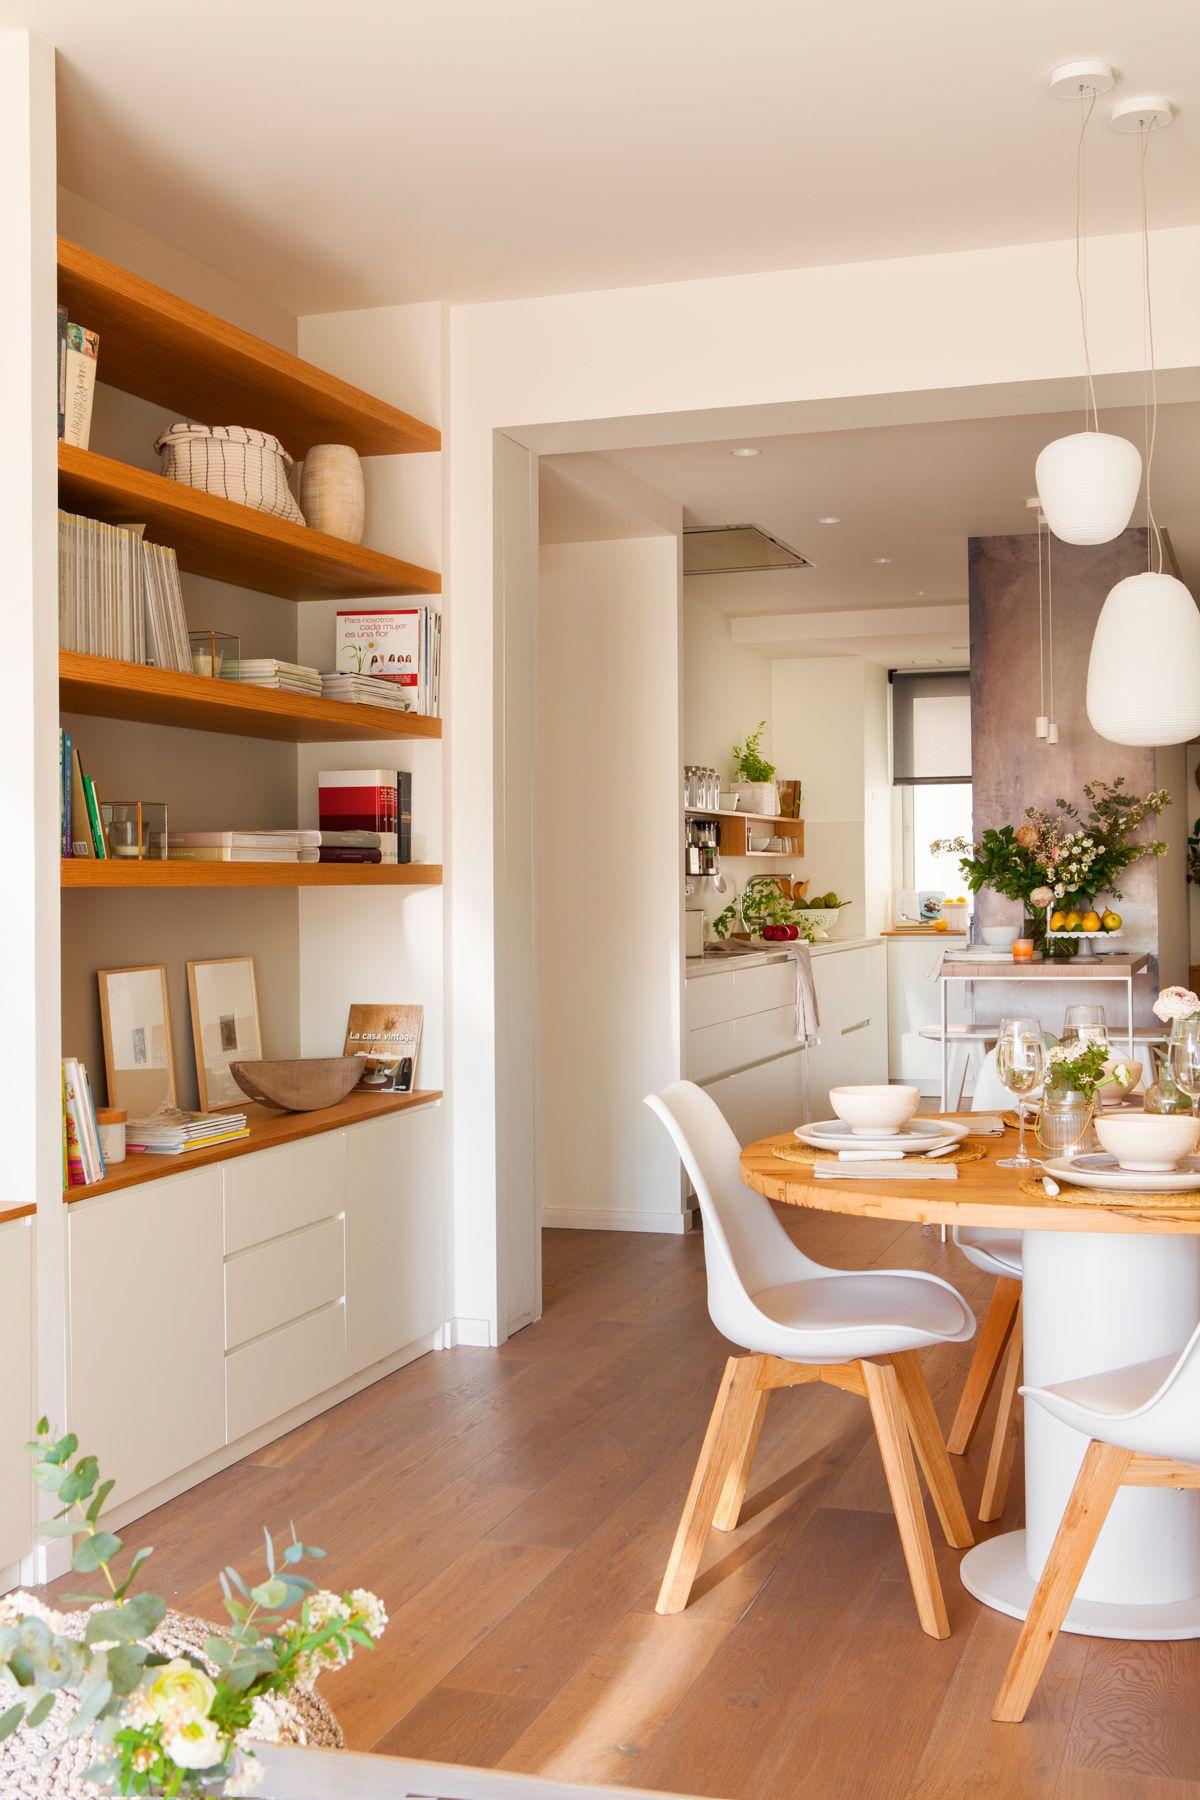 Comedor con librer a a medida mesa redonda y al fondo for Librerias para salones modernos